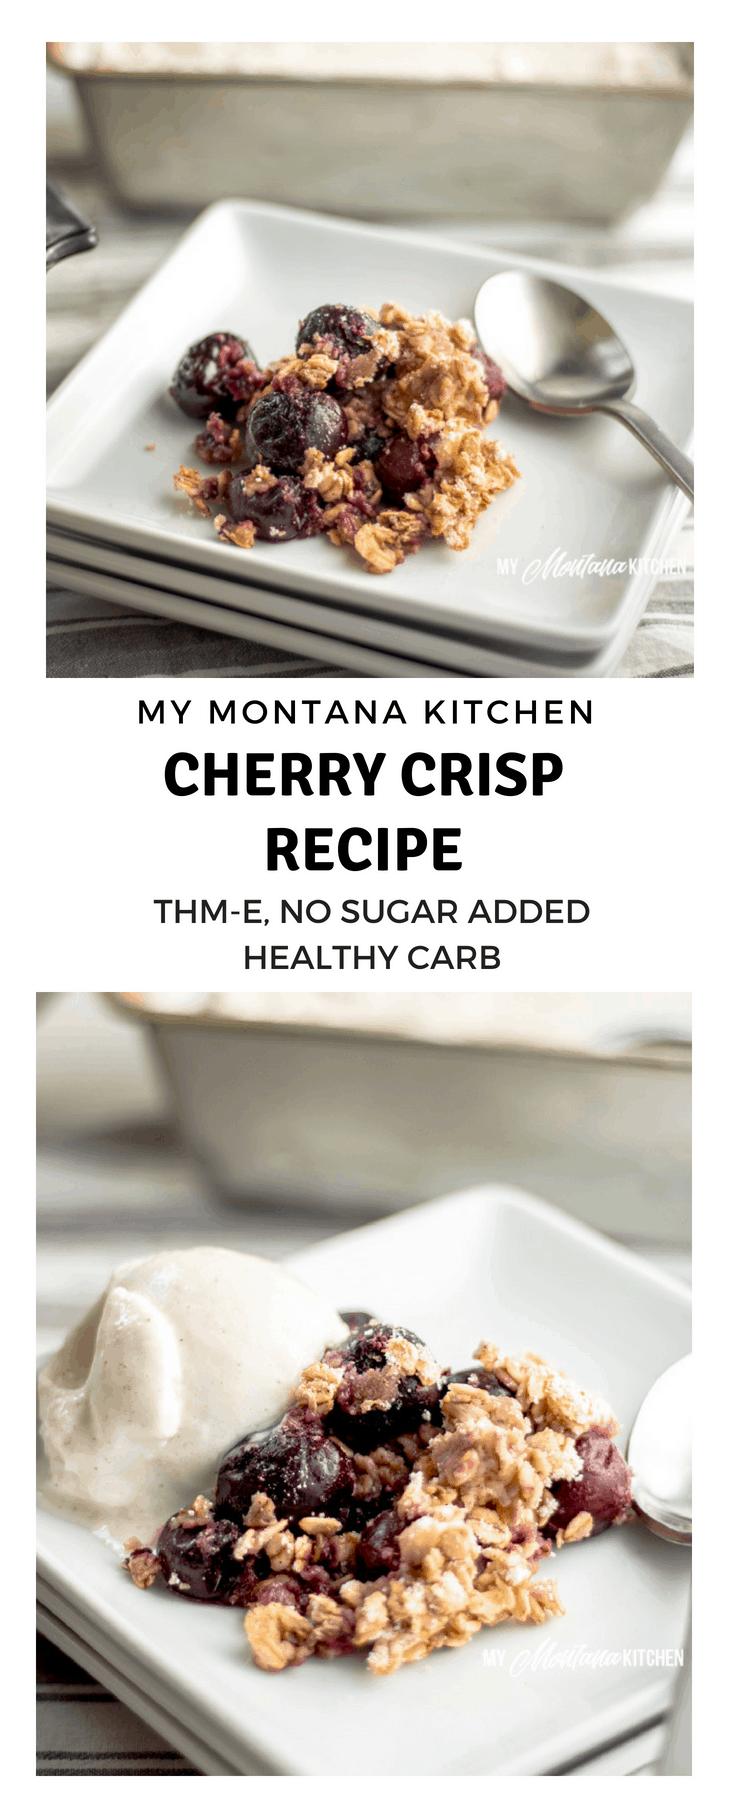 Cherry Crisp | THM-E, No Sugar Added | My Montana Kitchen